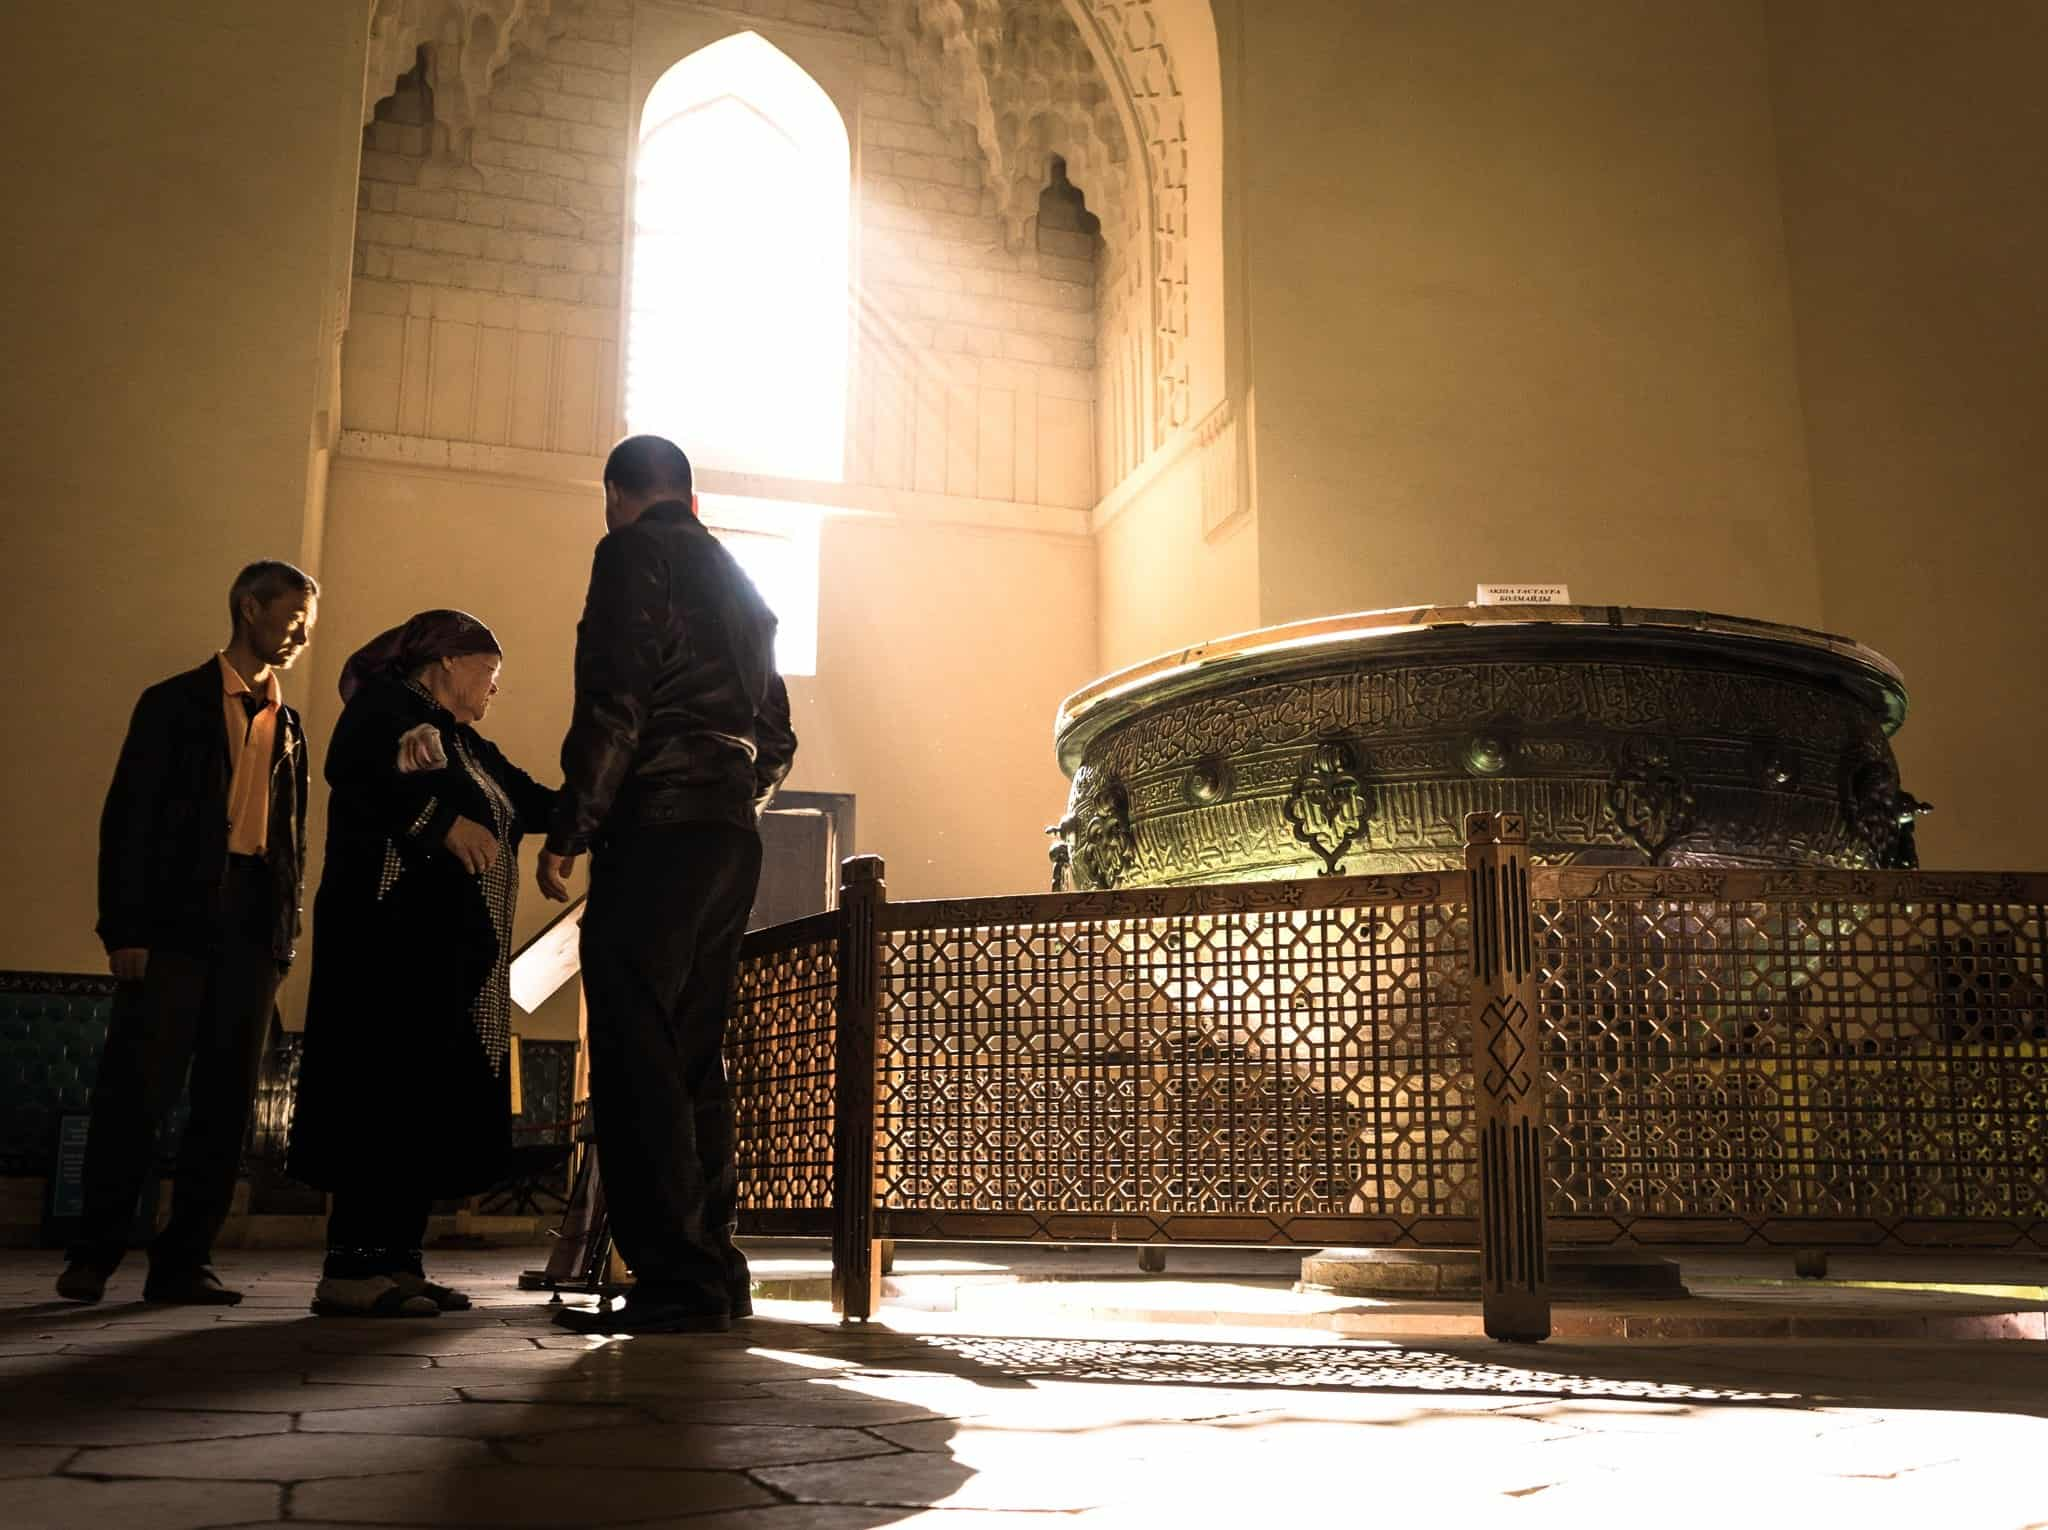 Cauldron Turkistan the Mausoleum of Khawaja Ahmed Yasawi